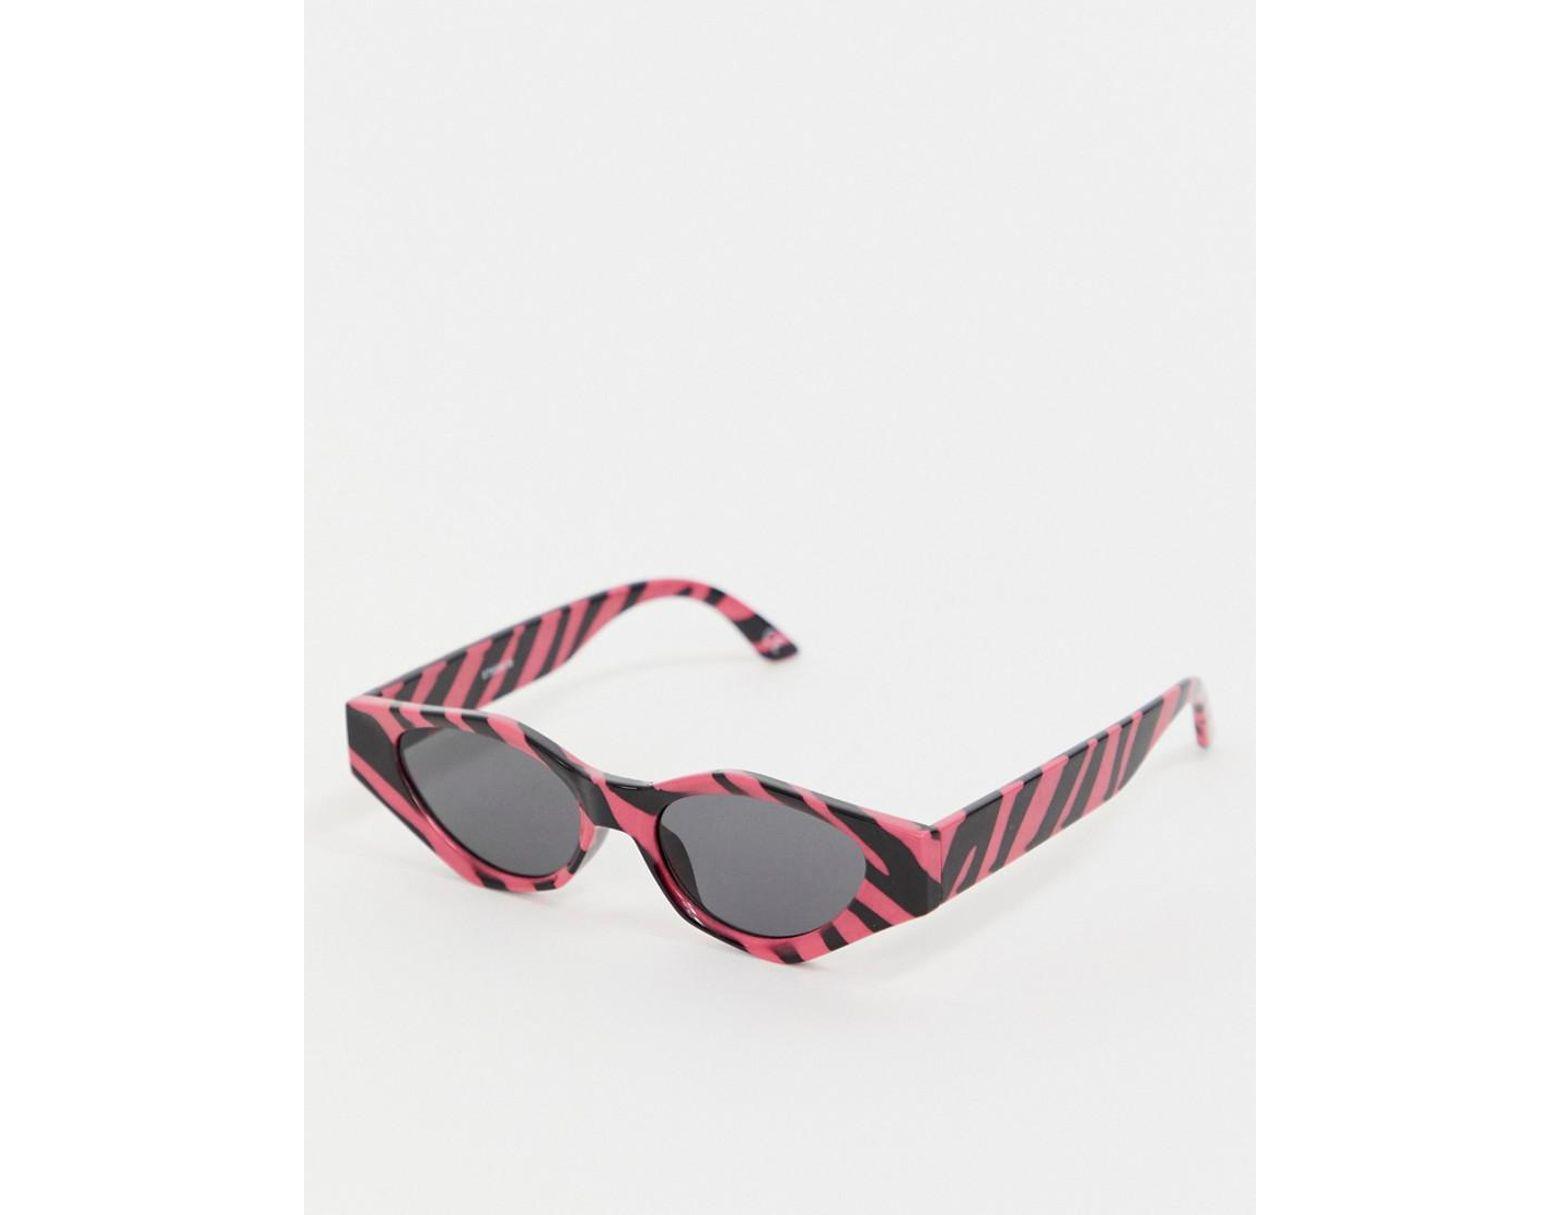 a4a62dbec ASOS Angular Cat Eye Sunglasses In Zebra Print in Pink - Lyst